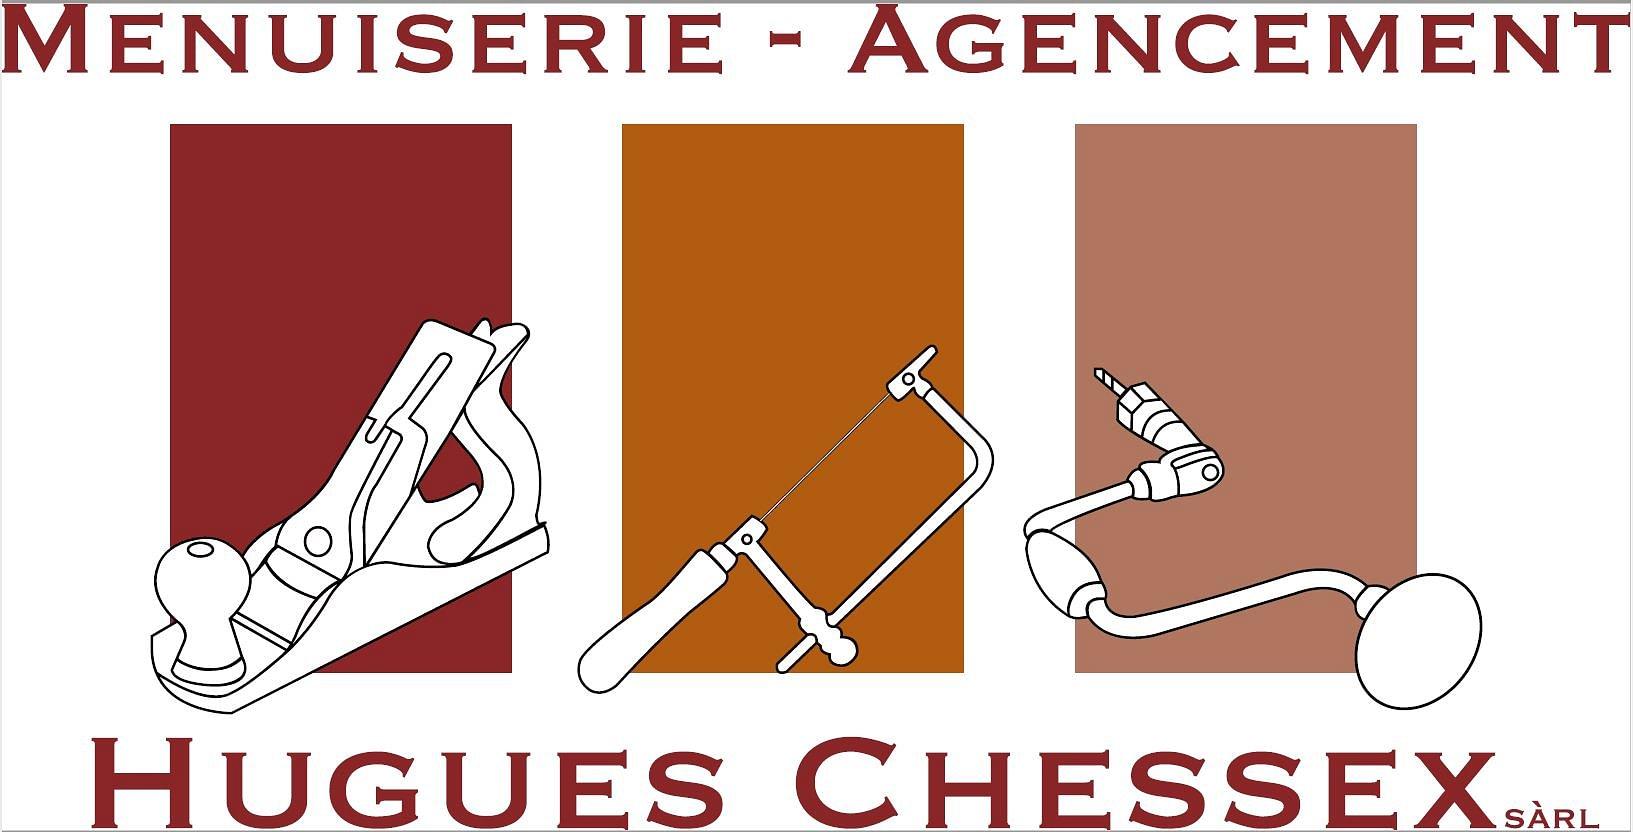 Menuiserie-Agencement Hugues Chessex Sàrl